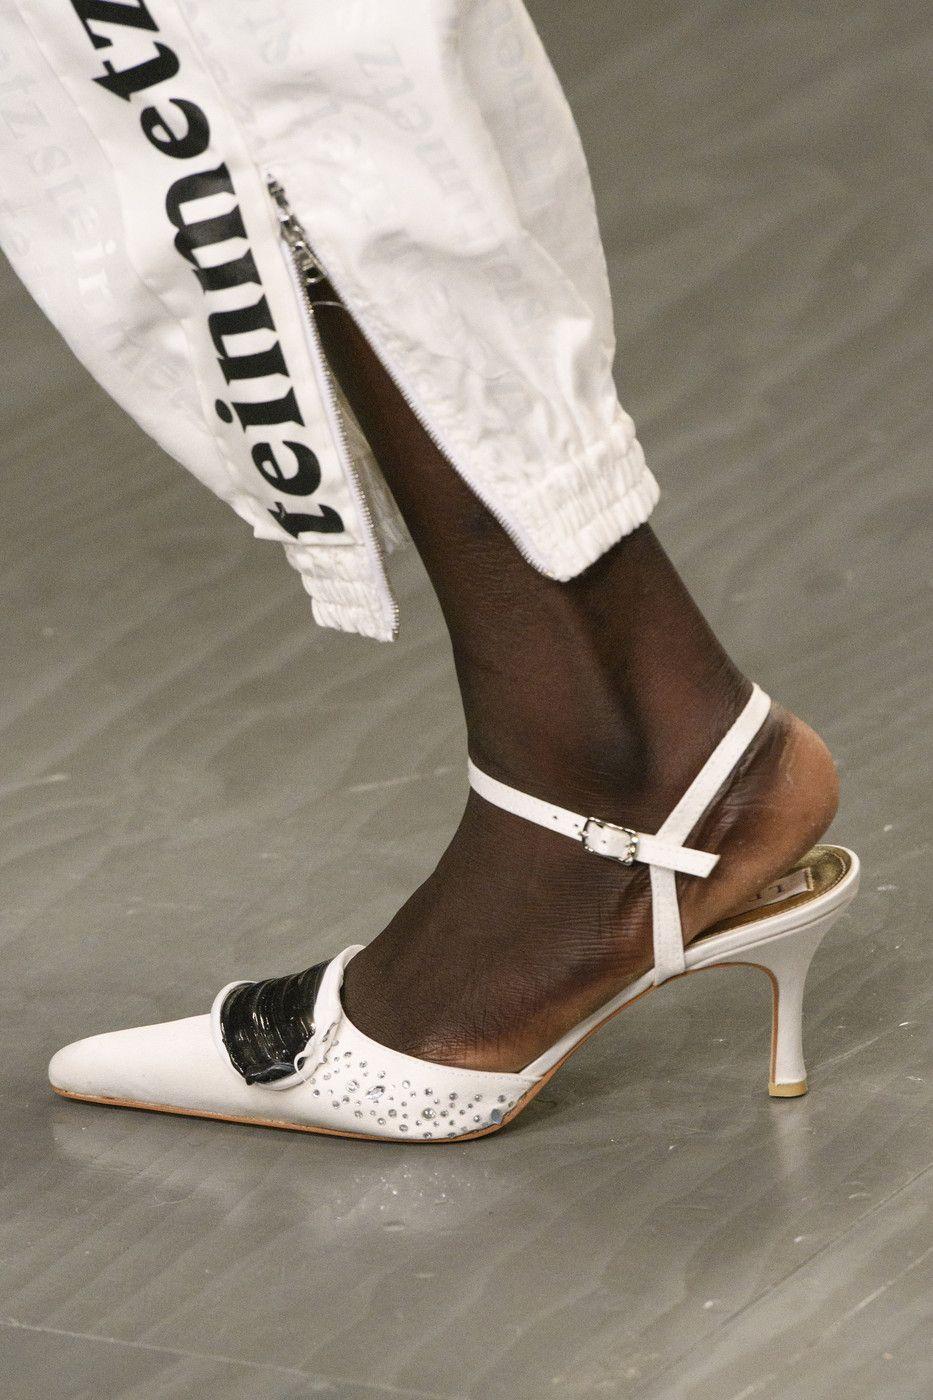 Faustine Steinmetz At London Fashion Week Spring 2018 Kitten Heel Shoes Womens Fashion Shoes Fabulous Shoes